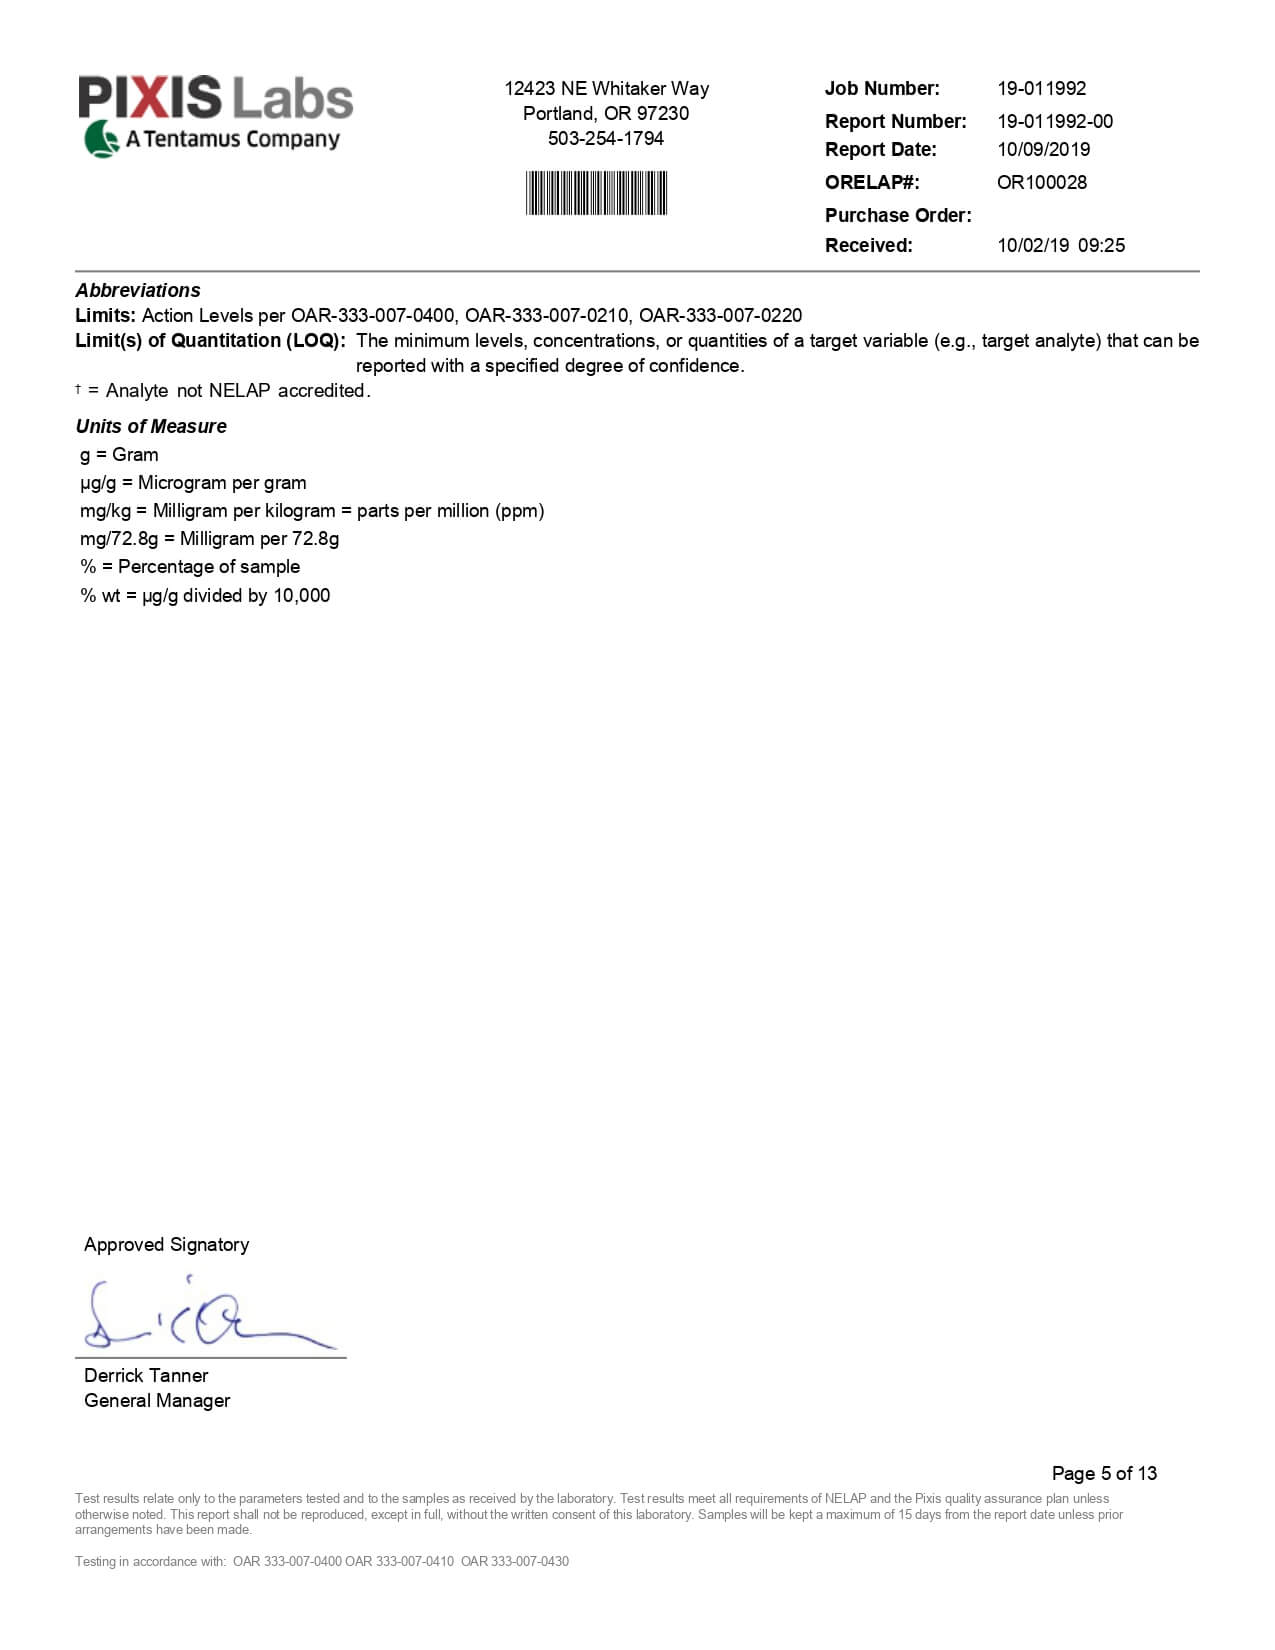 Social CBD Cooling Mint Muscle Balm Stick 400mg Lab Report